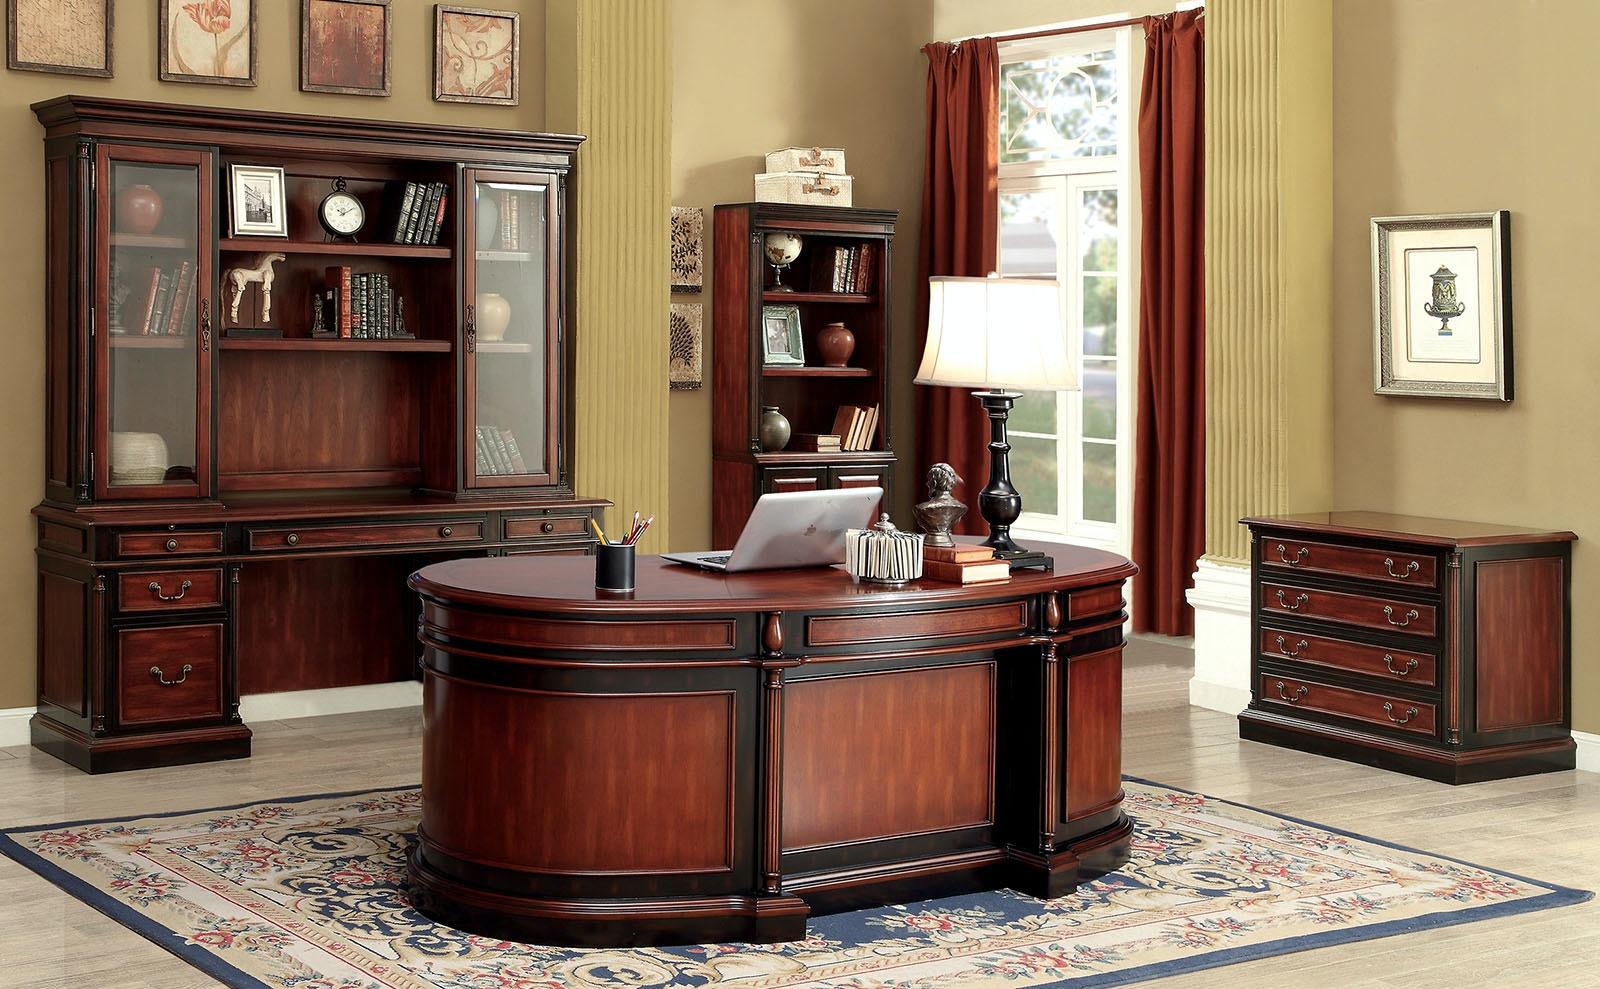 Desk in oval office Lbj Furniture Of America Home Office Oval Office Desk Cmdk6255do At The Furniture Mall The Furniture Mall Furniture Of America Home Office Oval Office Desk Cmdk6255do The